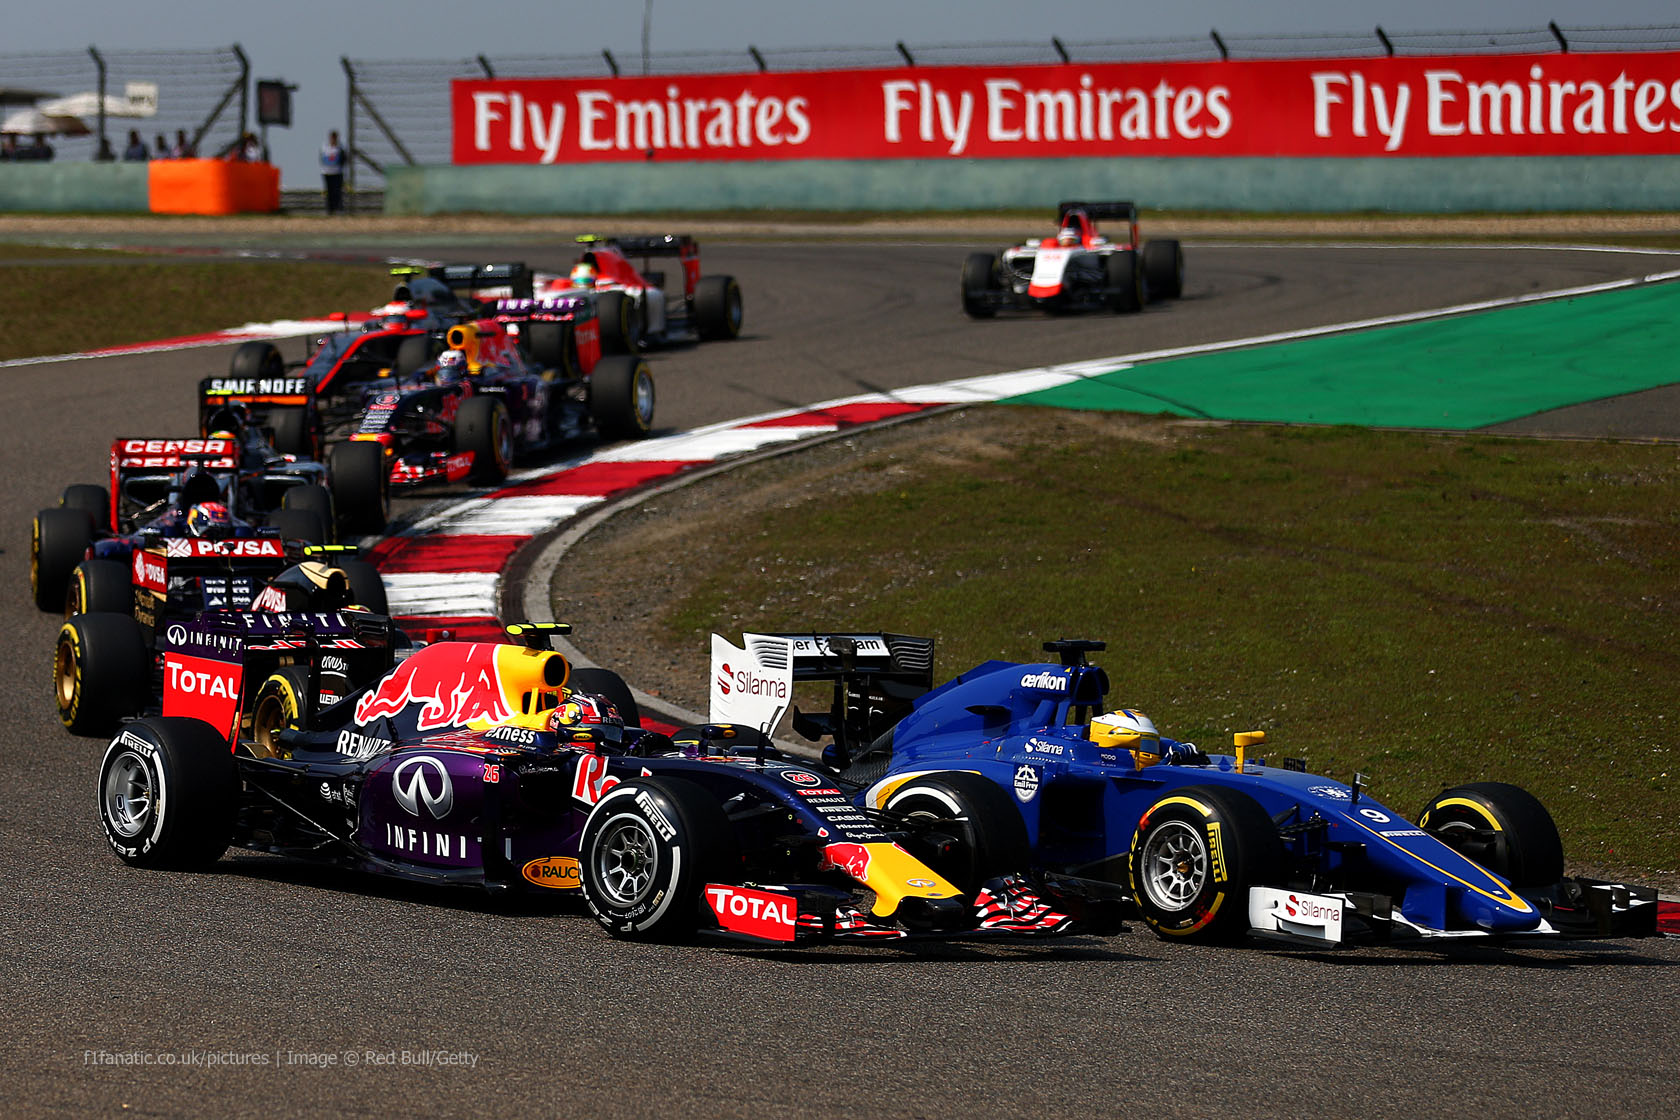 Daniil Kvyat, Red Bull, Shanghai International Circuit, 2015